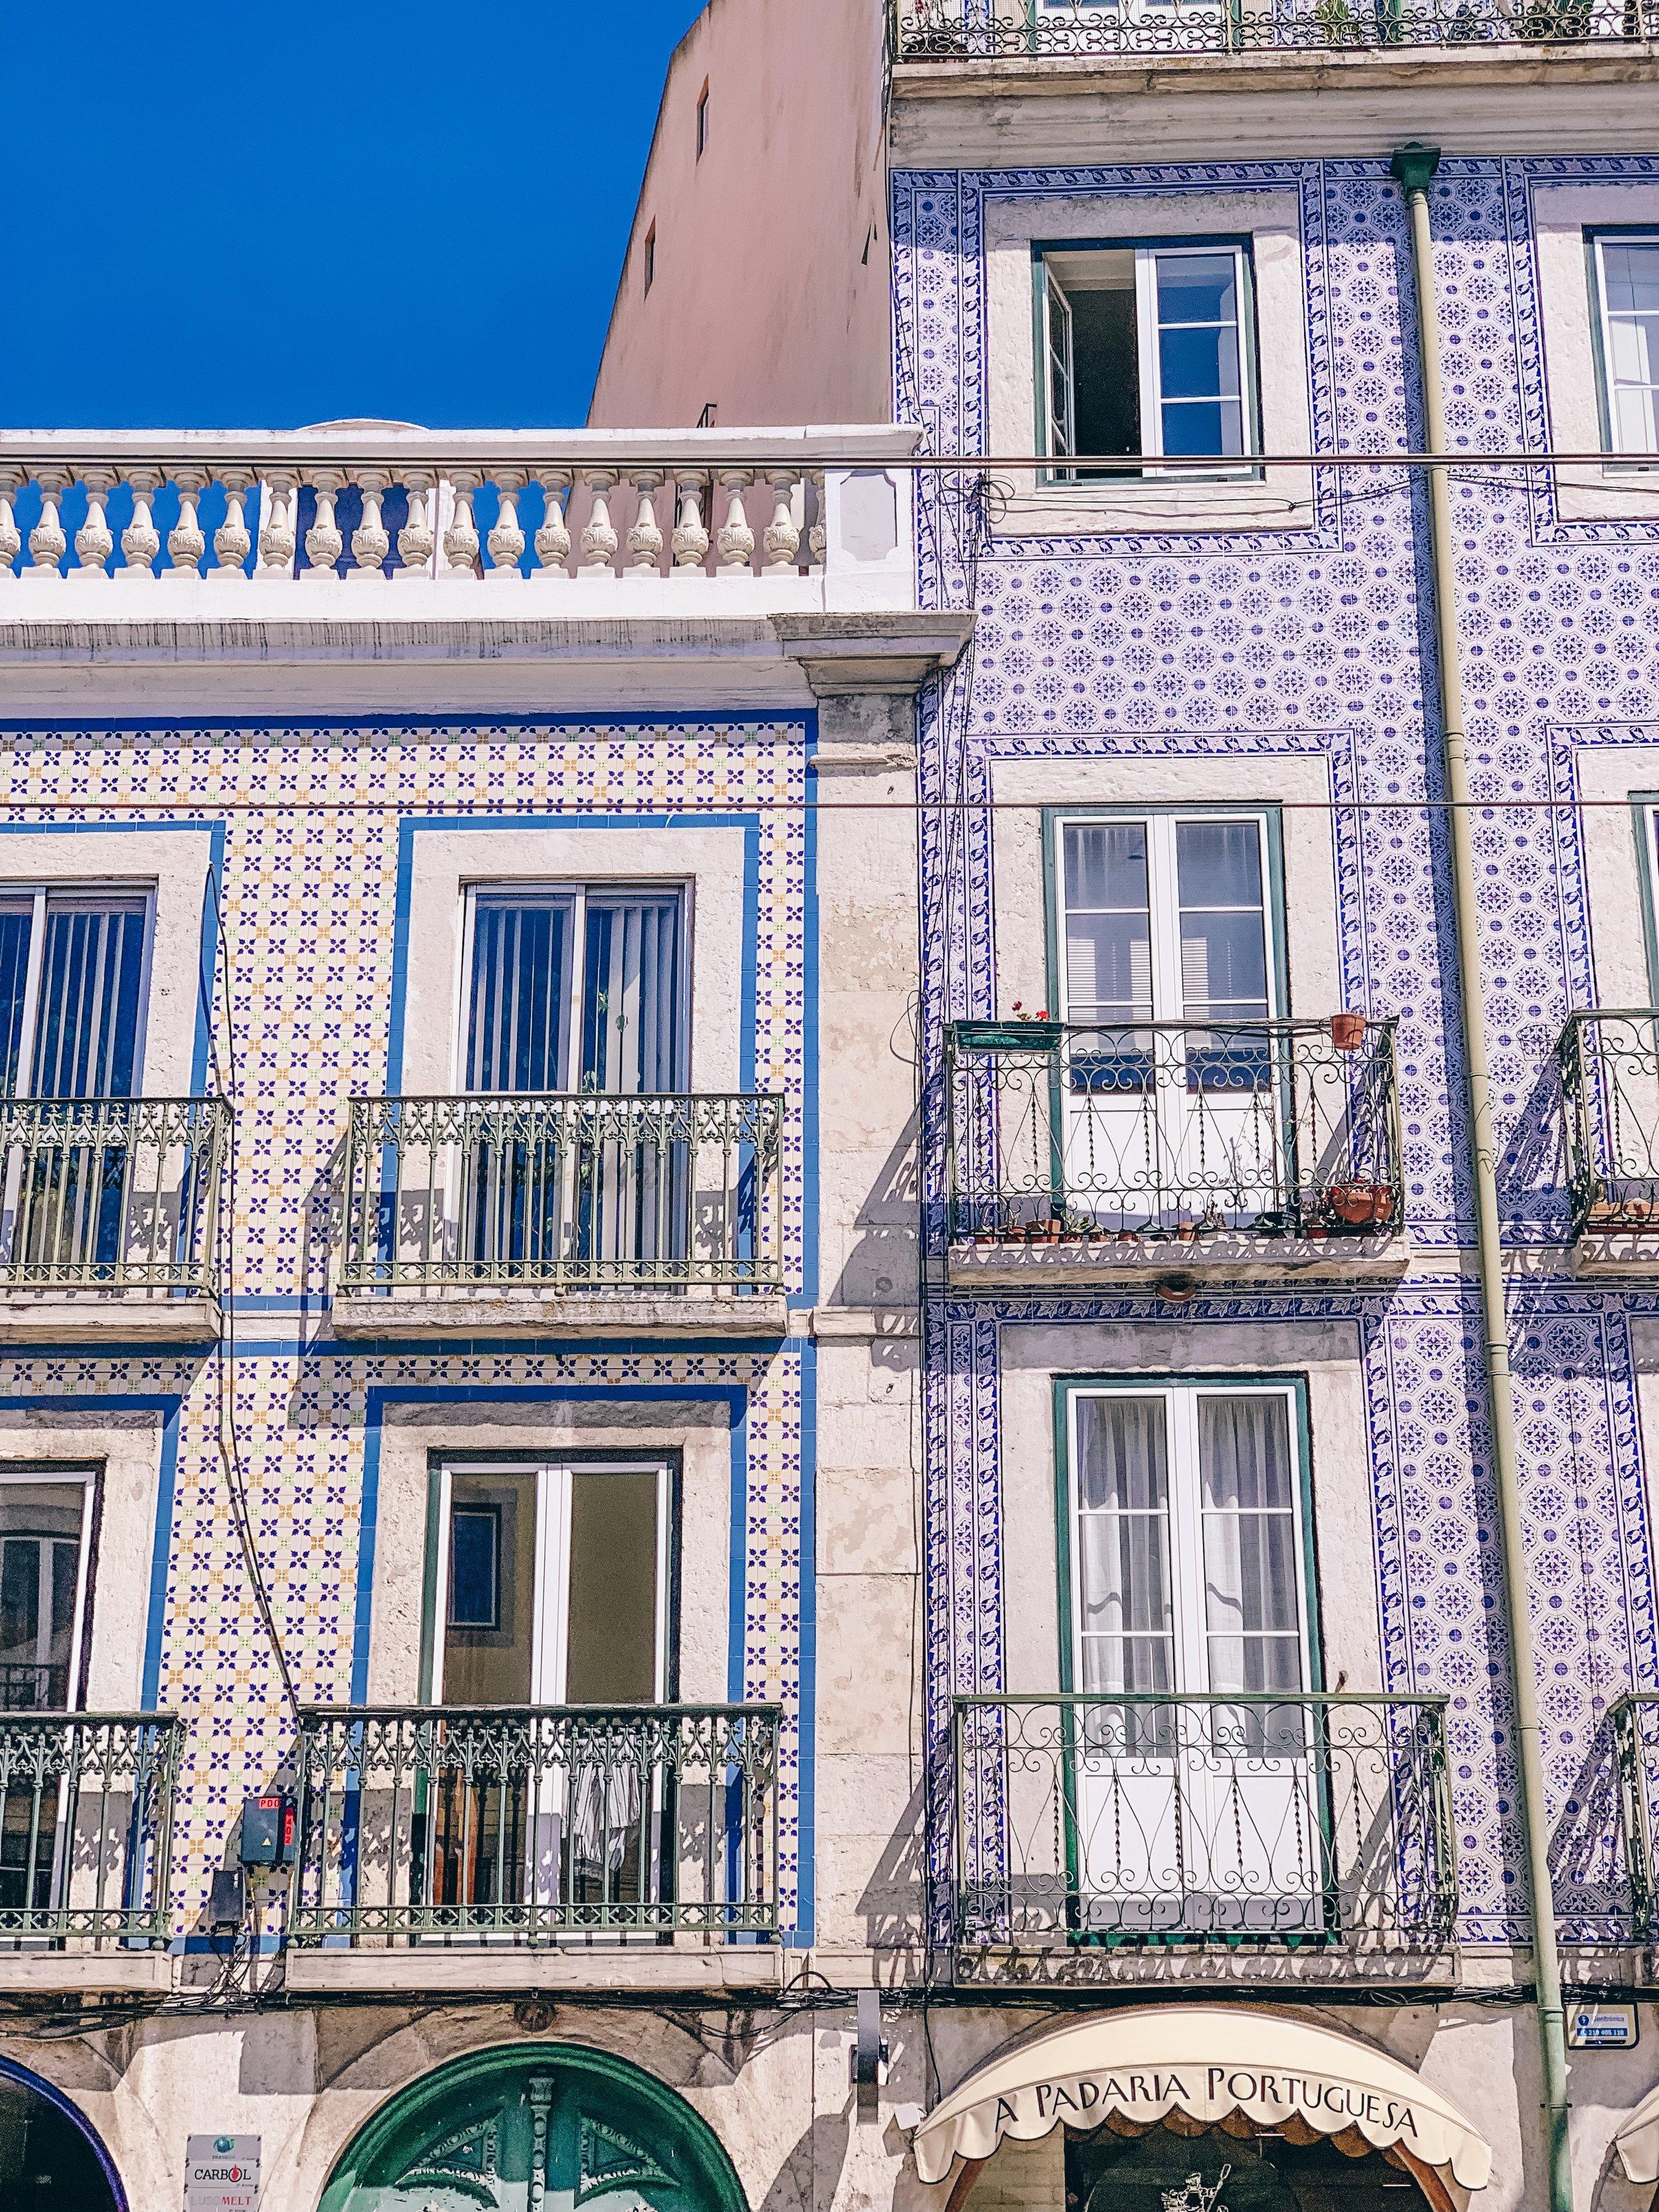 Colorful buildings of Lisbon